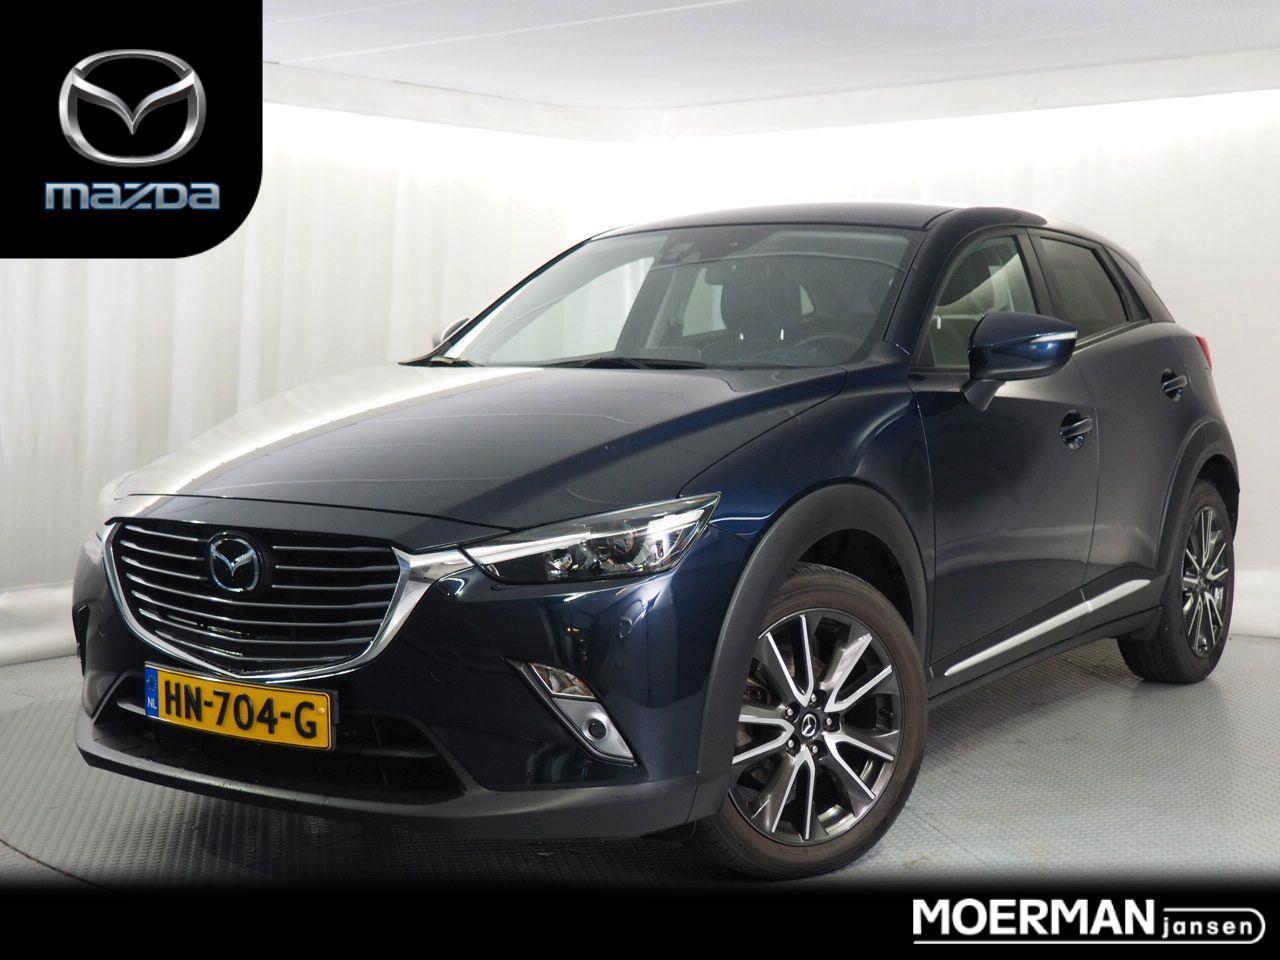 Mazda Cx-3 2.0 skyactiv-g 120 gt-m / 64.000km / head-up display / bose installatie / radar cruise ctrl / dealer onderhouden